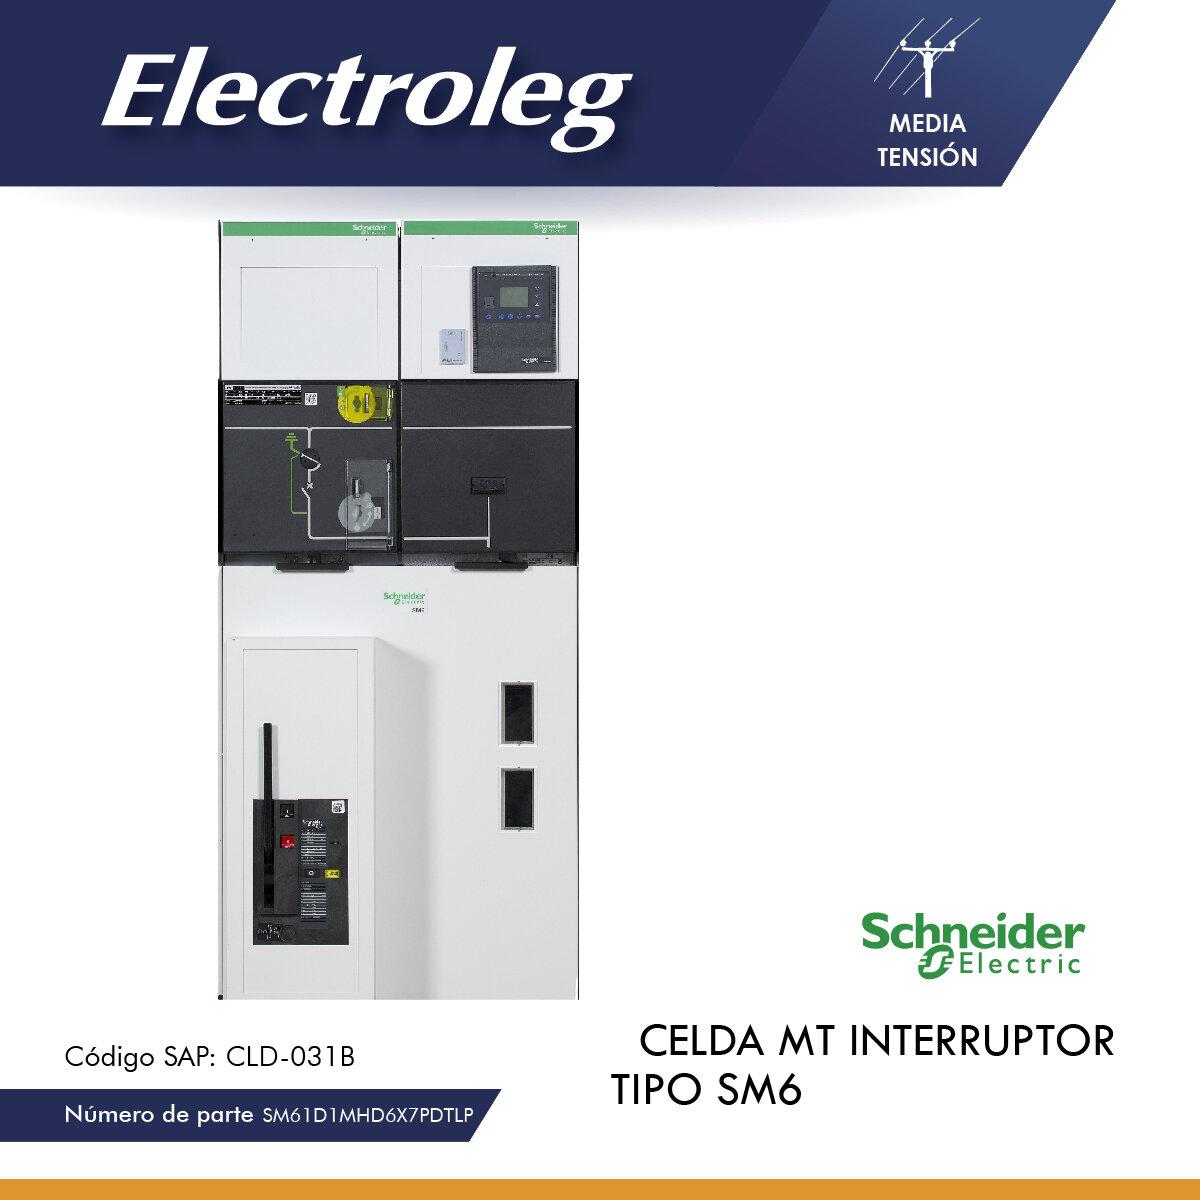 CELDA INTERRUPTOR DM1-A 24KV C/SEPAM S20